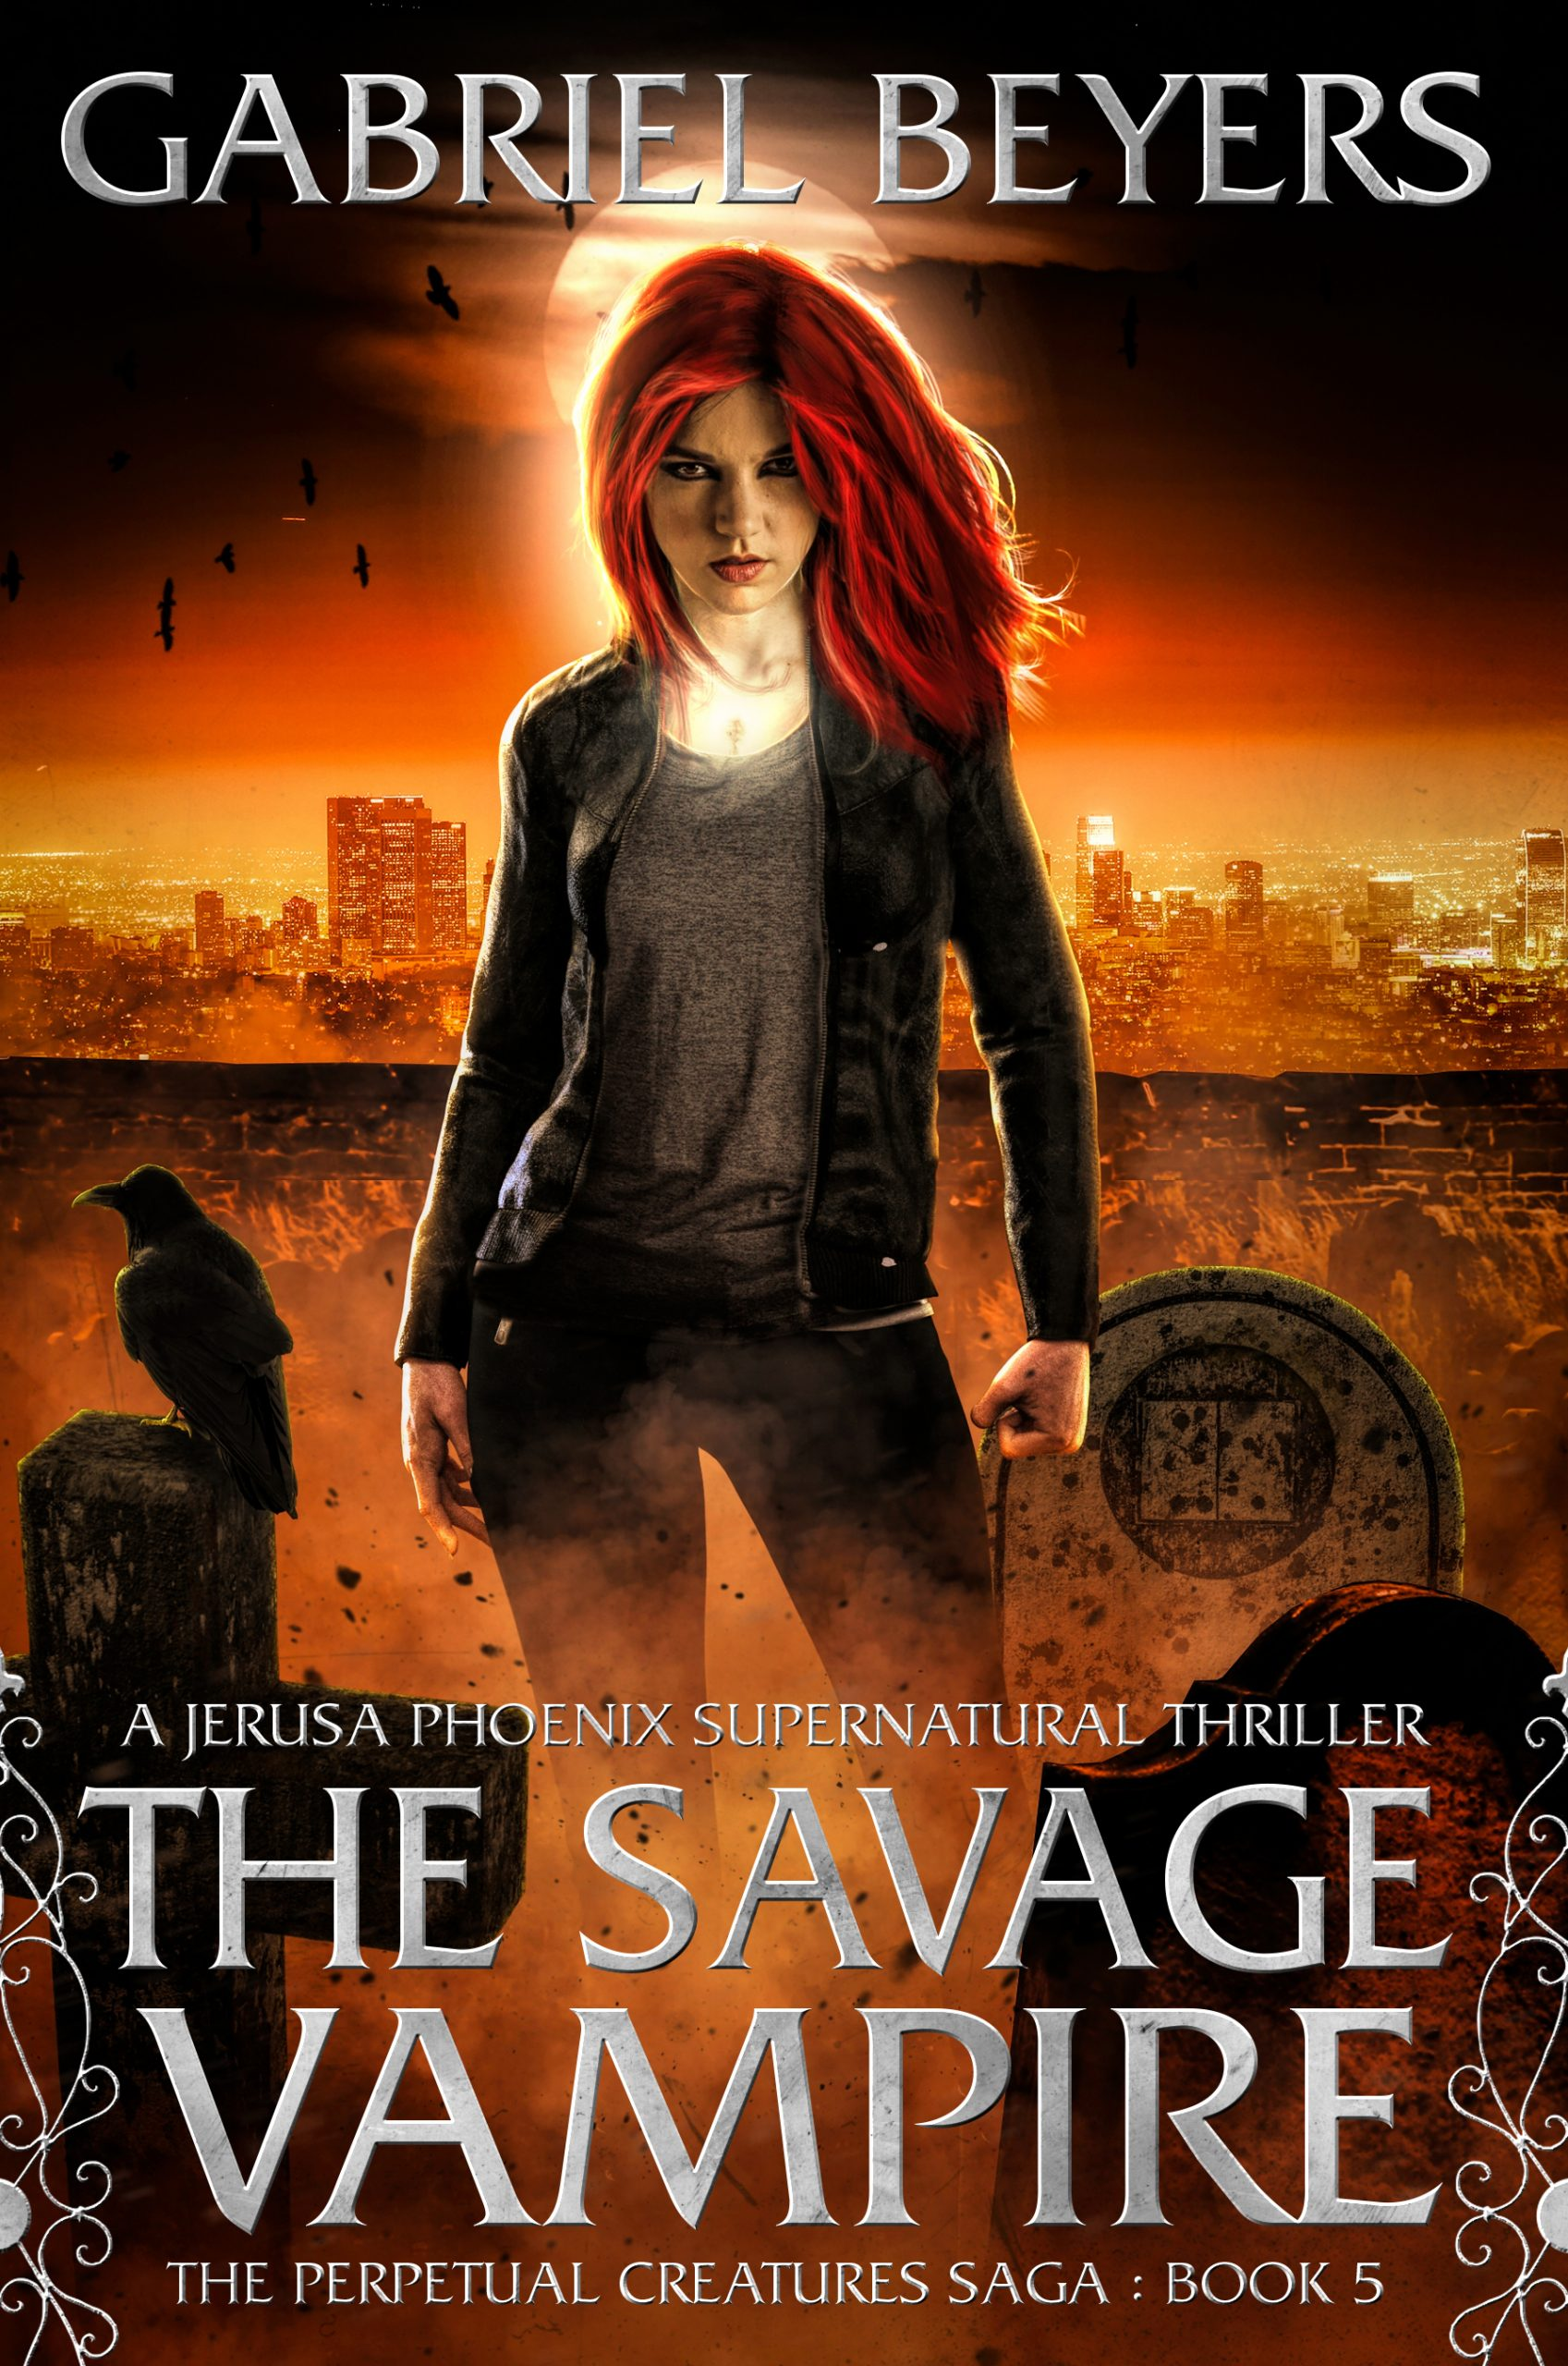 The Savage Vampire